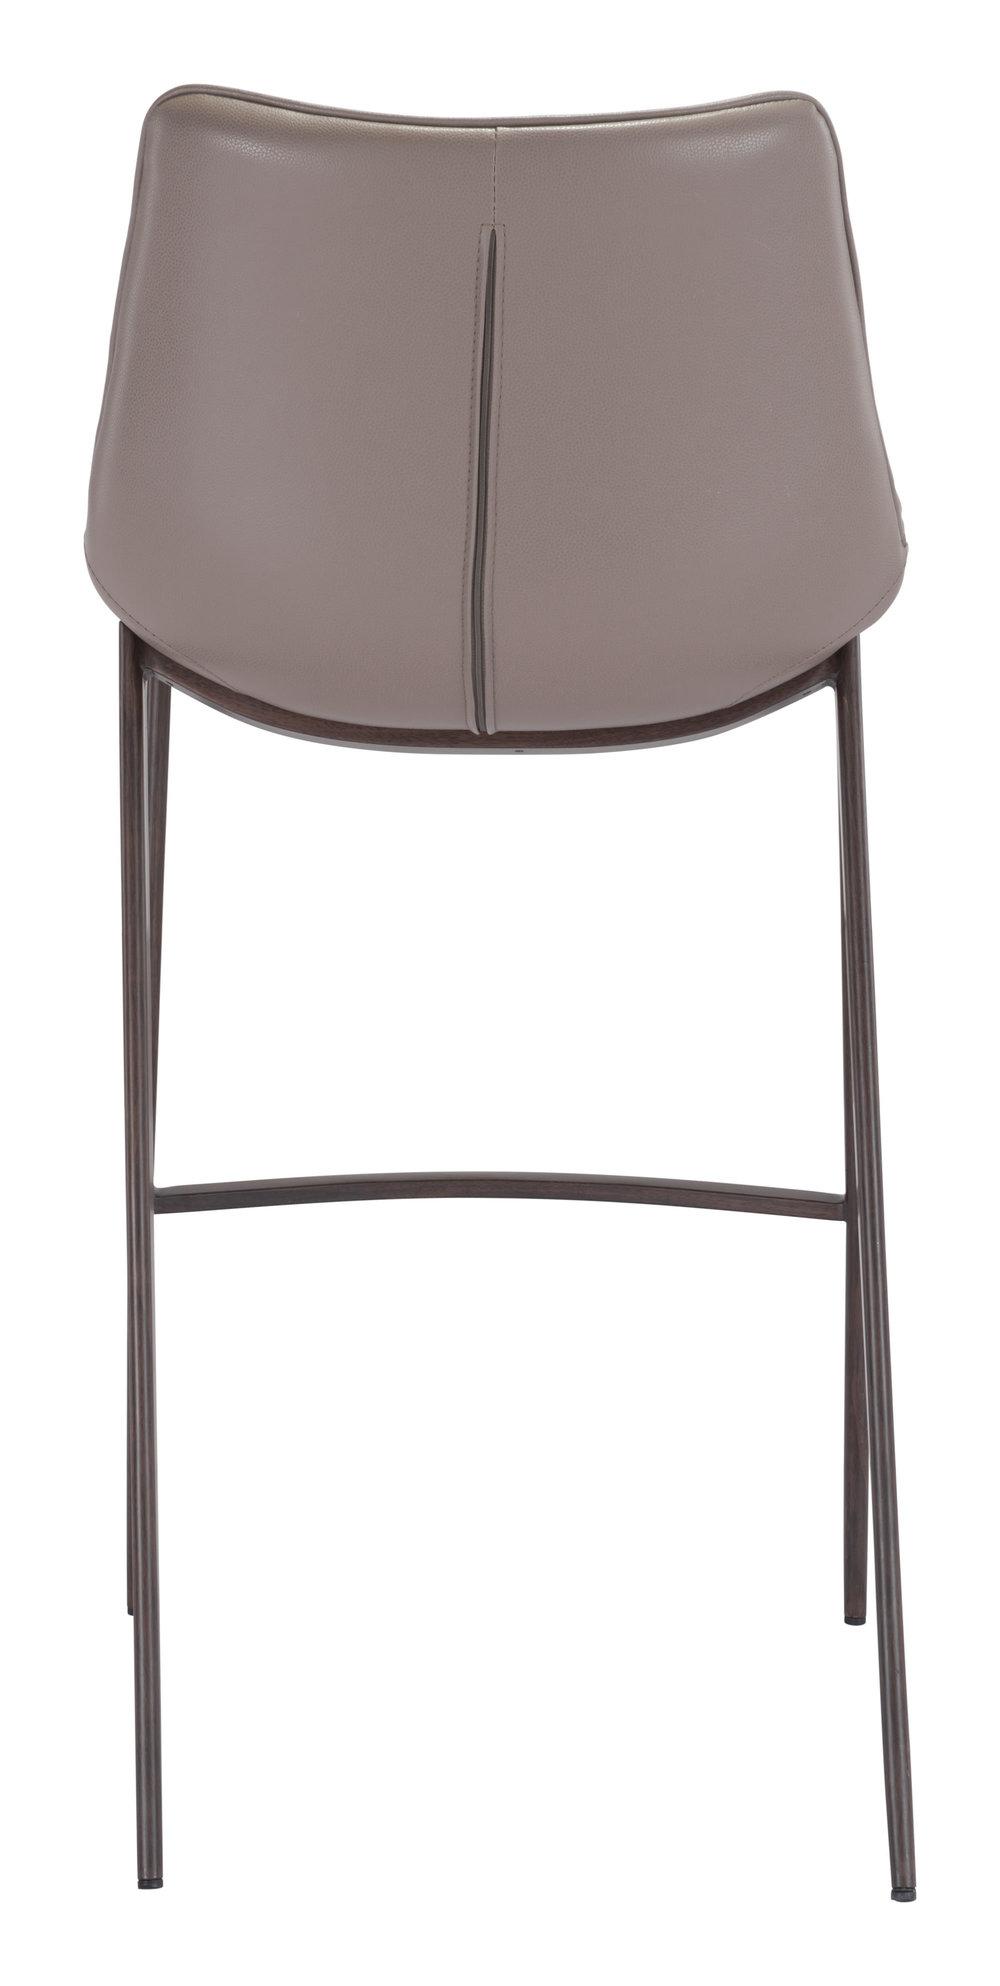 Zuo Modern Contemporary - Magnus Bar Chair, Set/2, Gray & Walnut